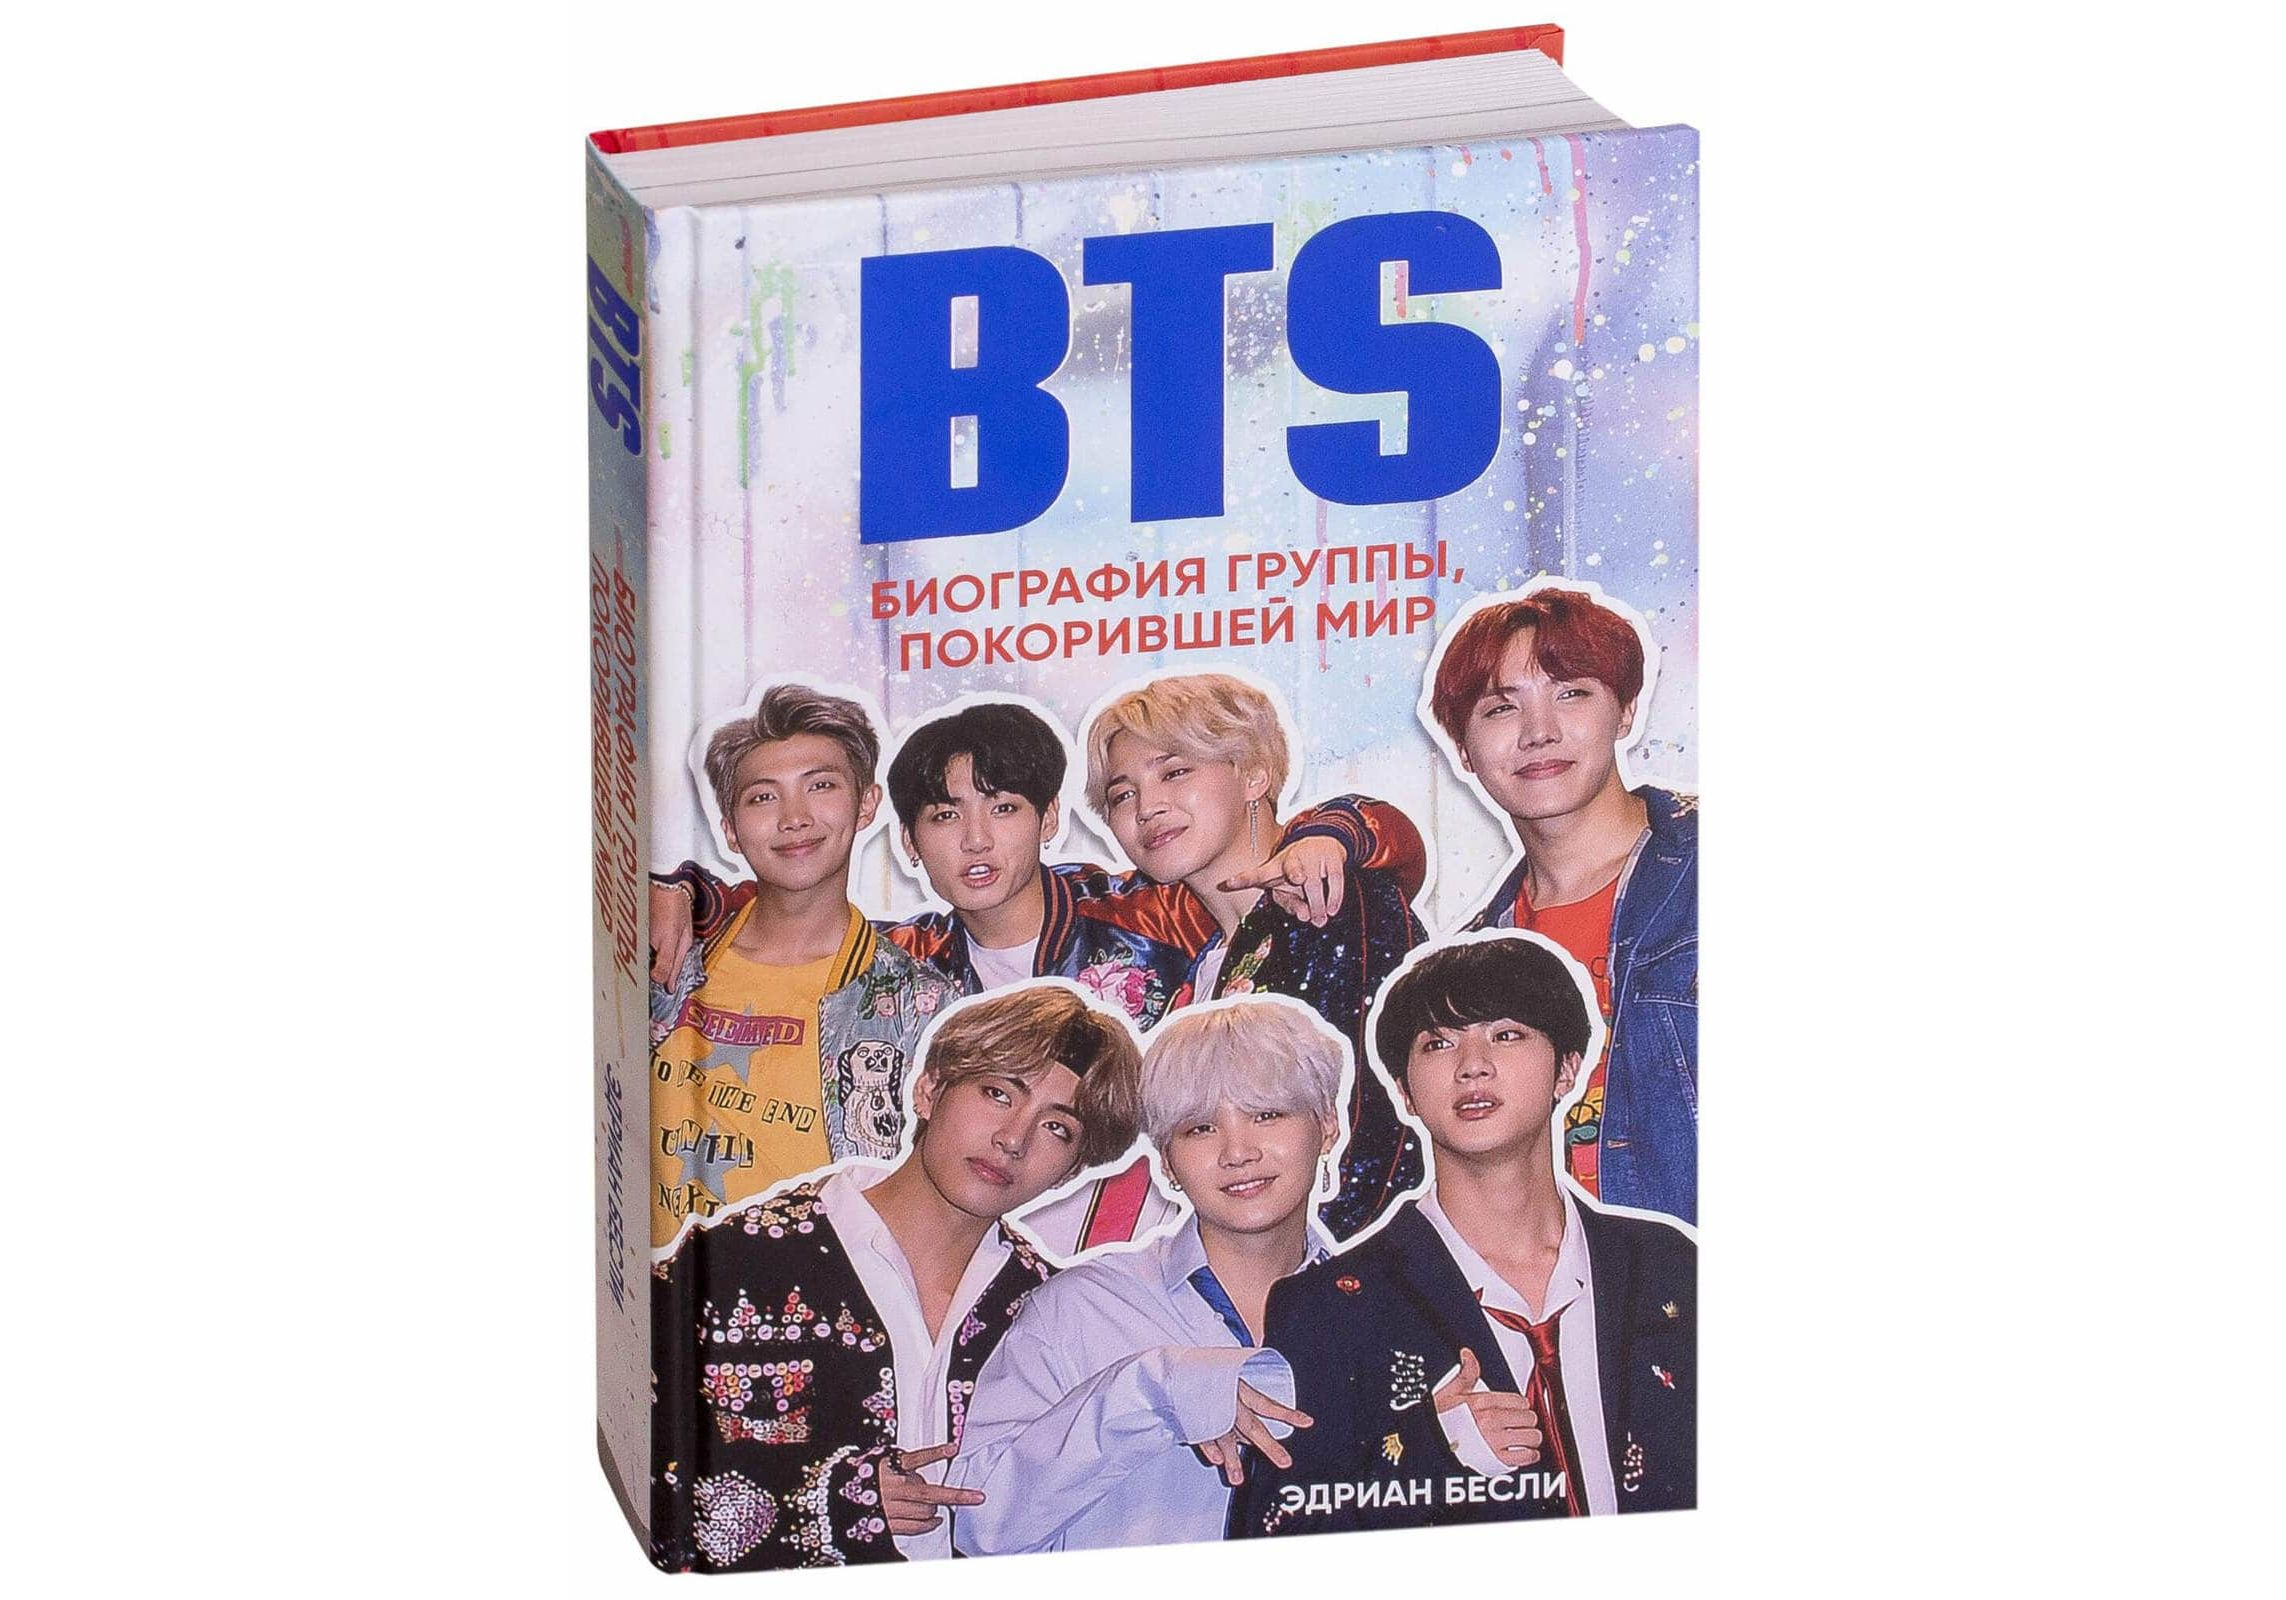 Bts — on: перевод песни, текст на русском языке, значение песни